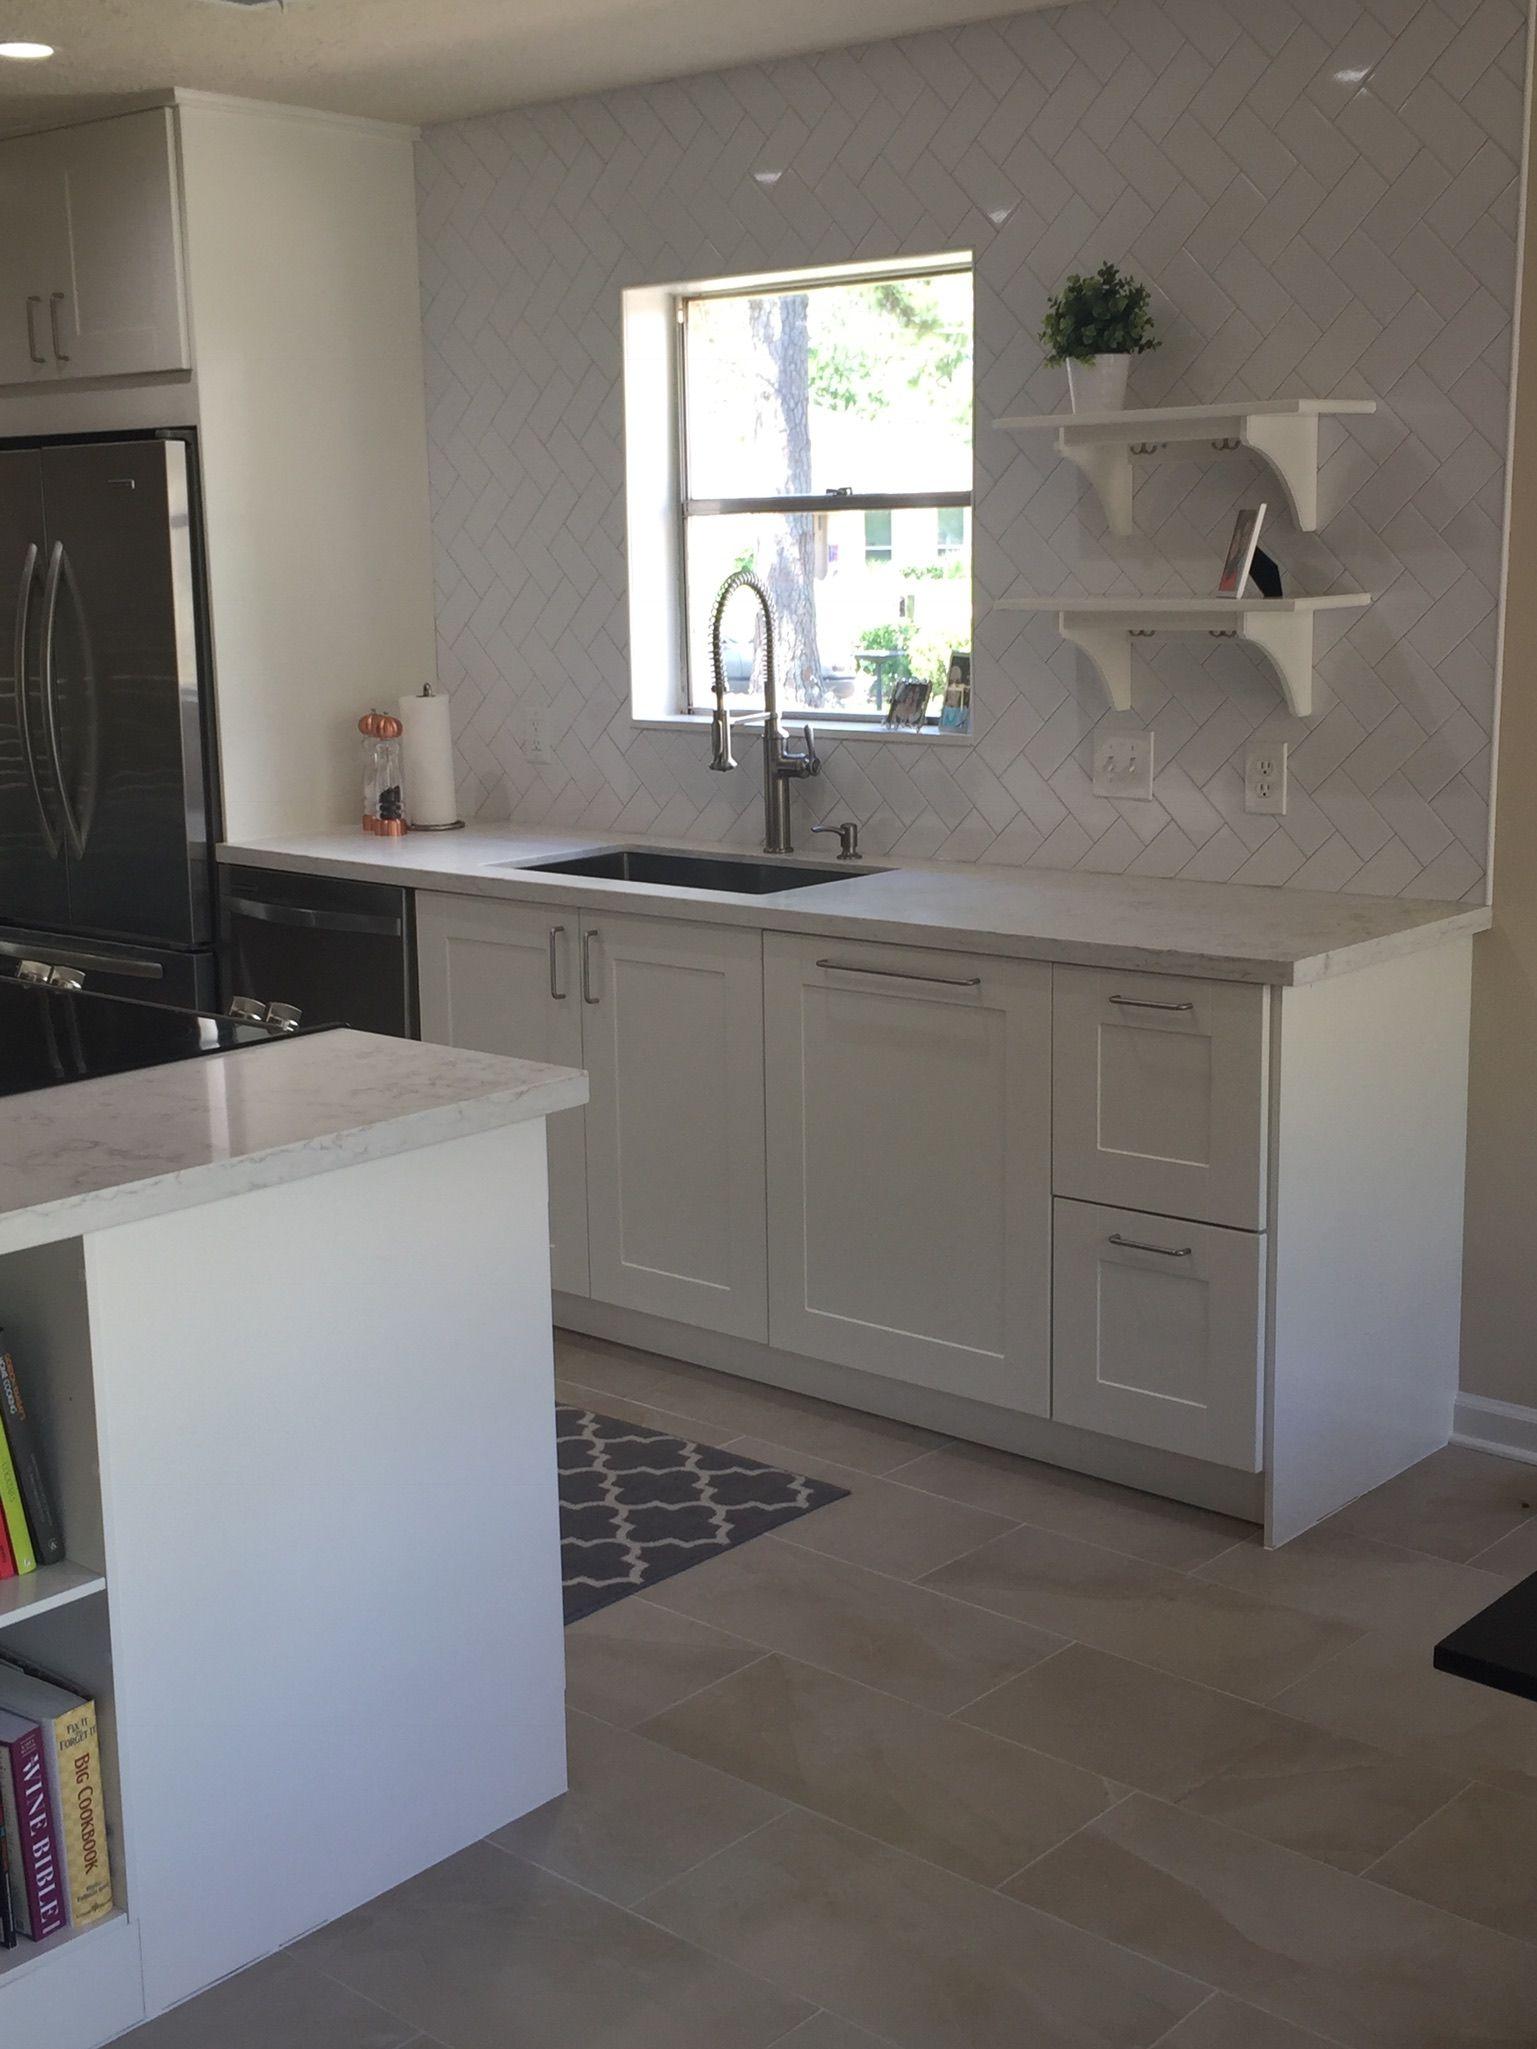 Best Ikea Grimslov Off White Cabinets Kohler Faucet Open 400 x 300